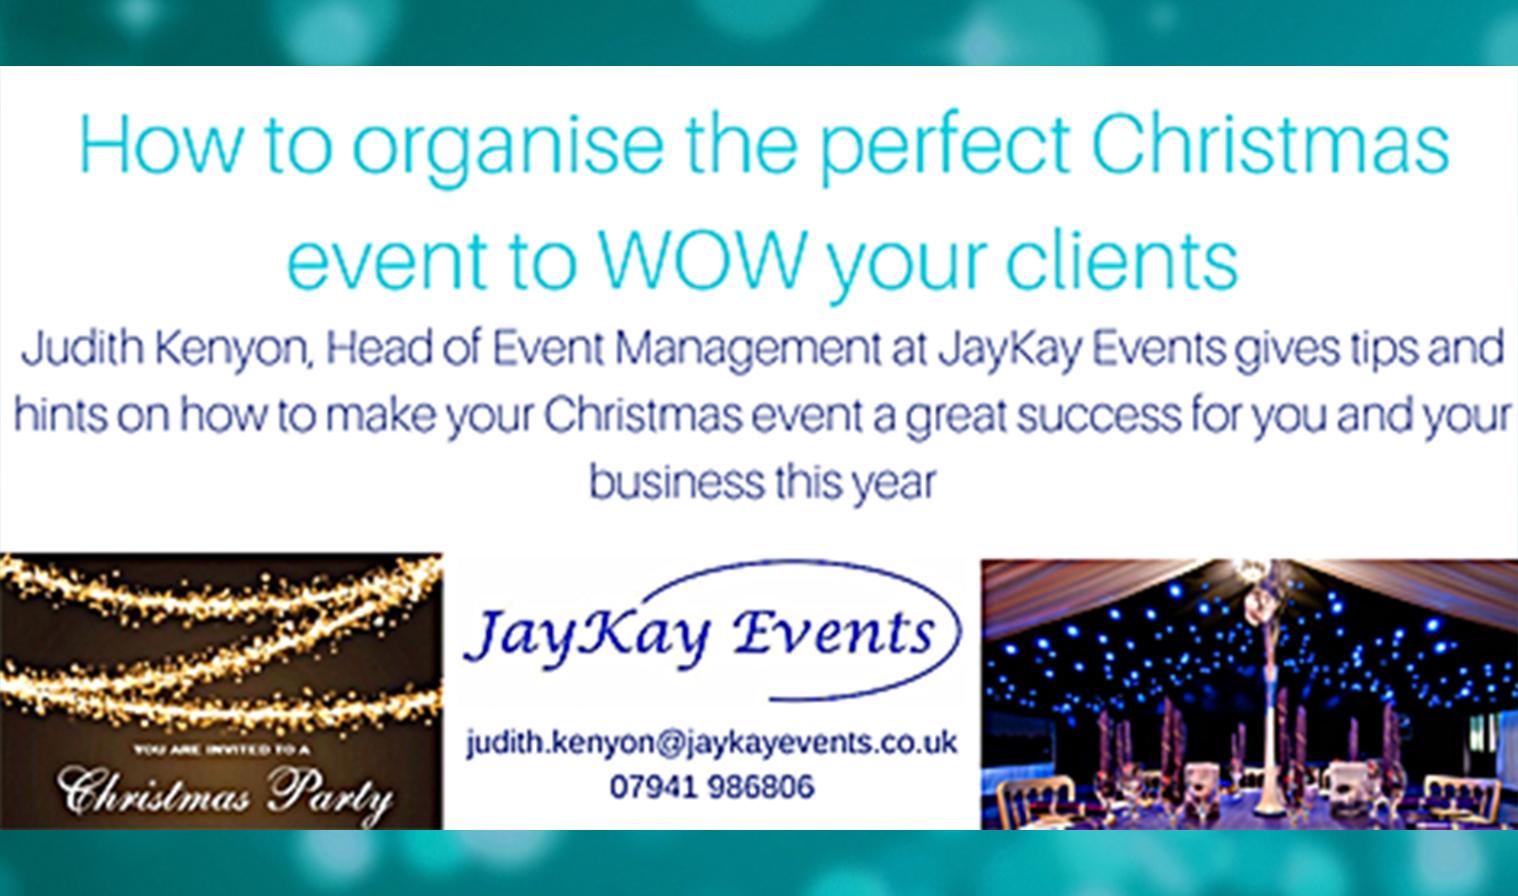 JayKay Events